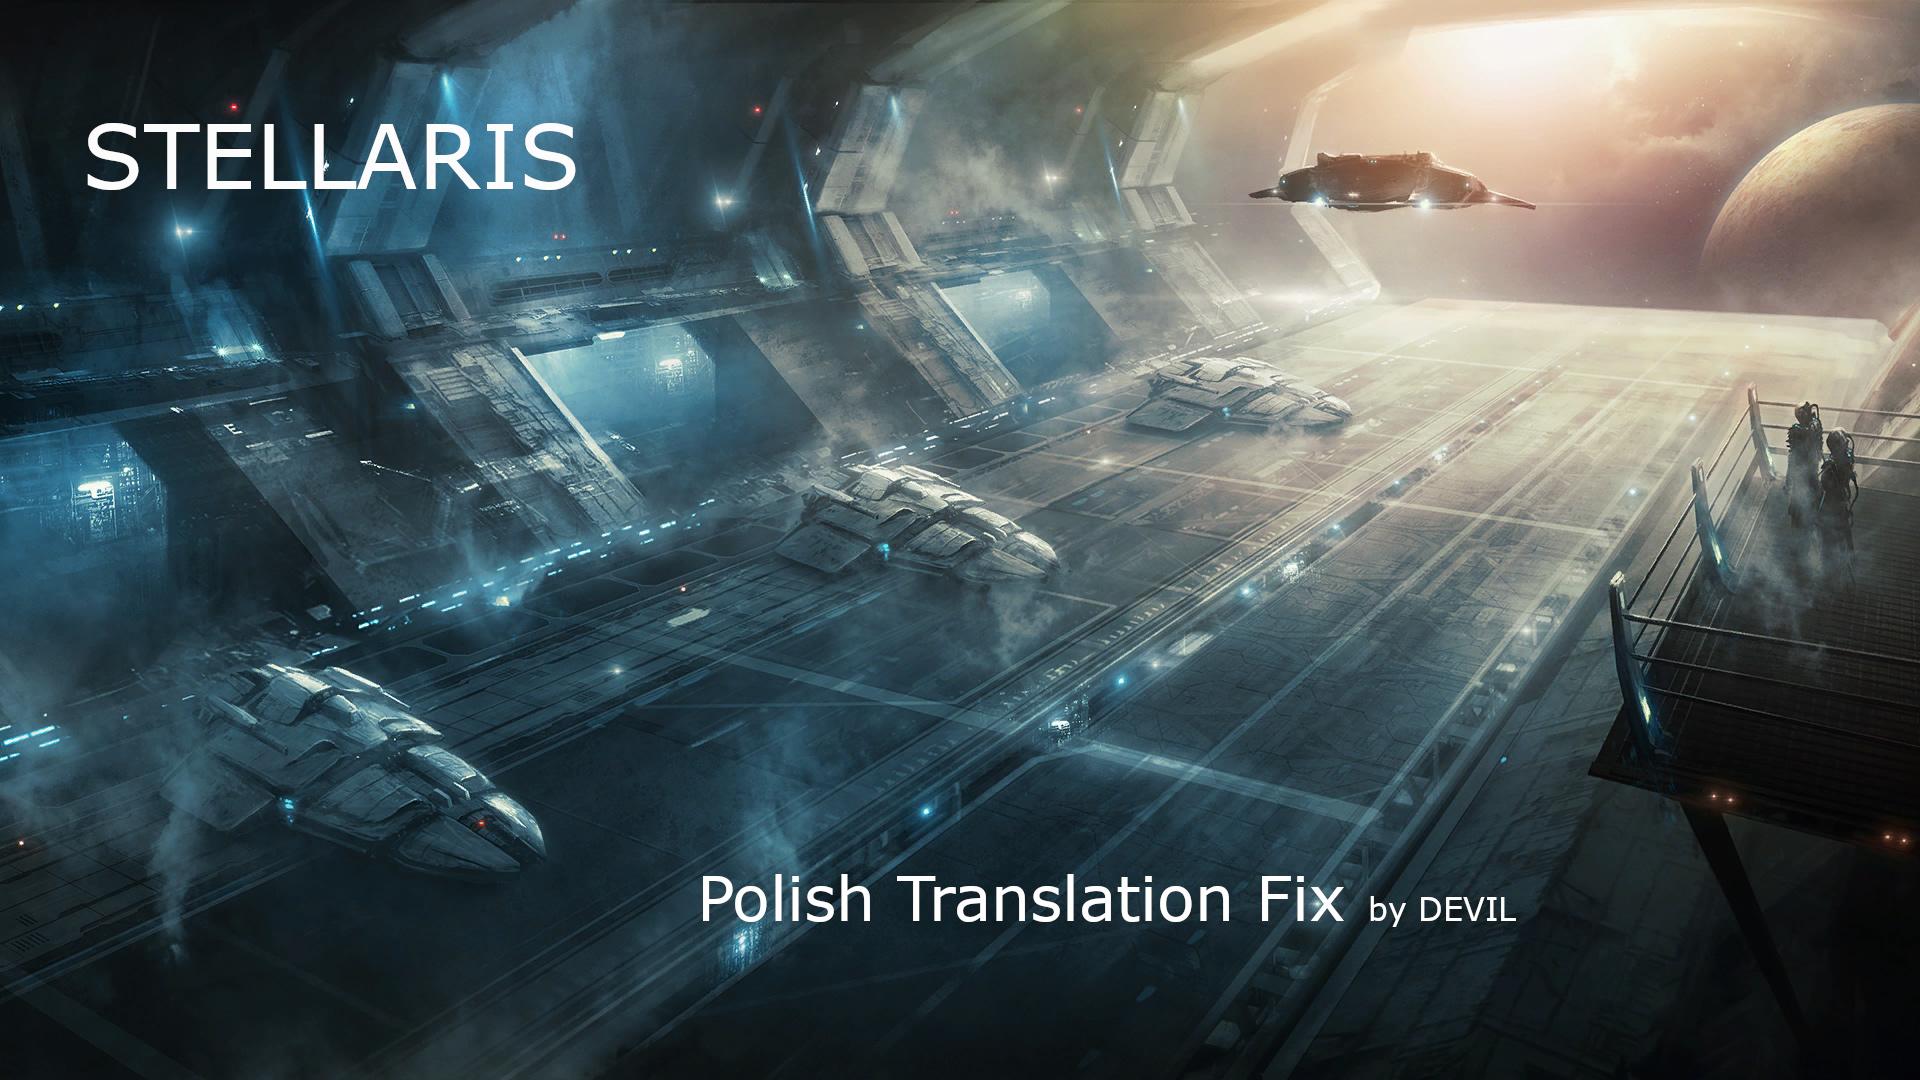 Polish Translation Fix